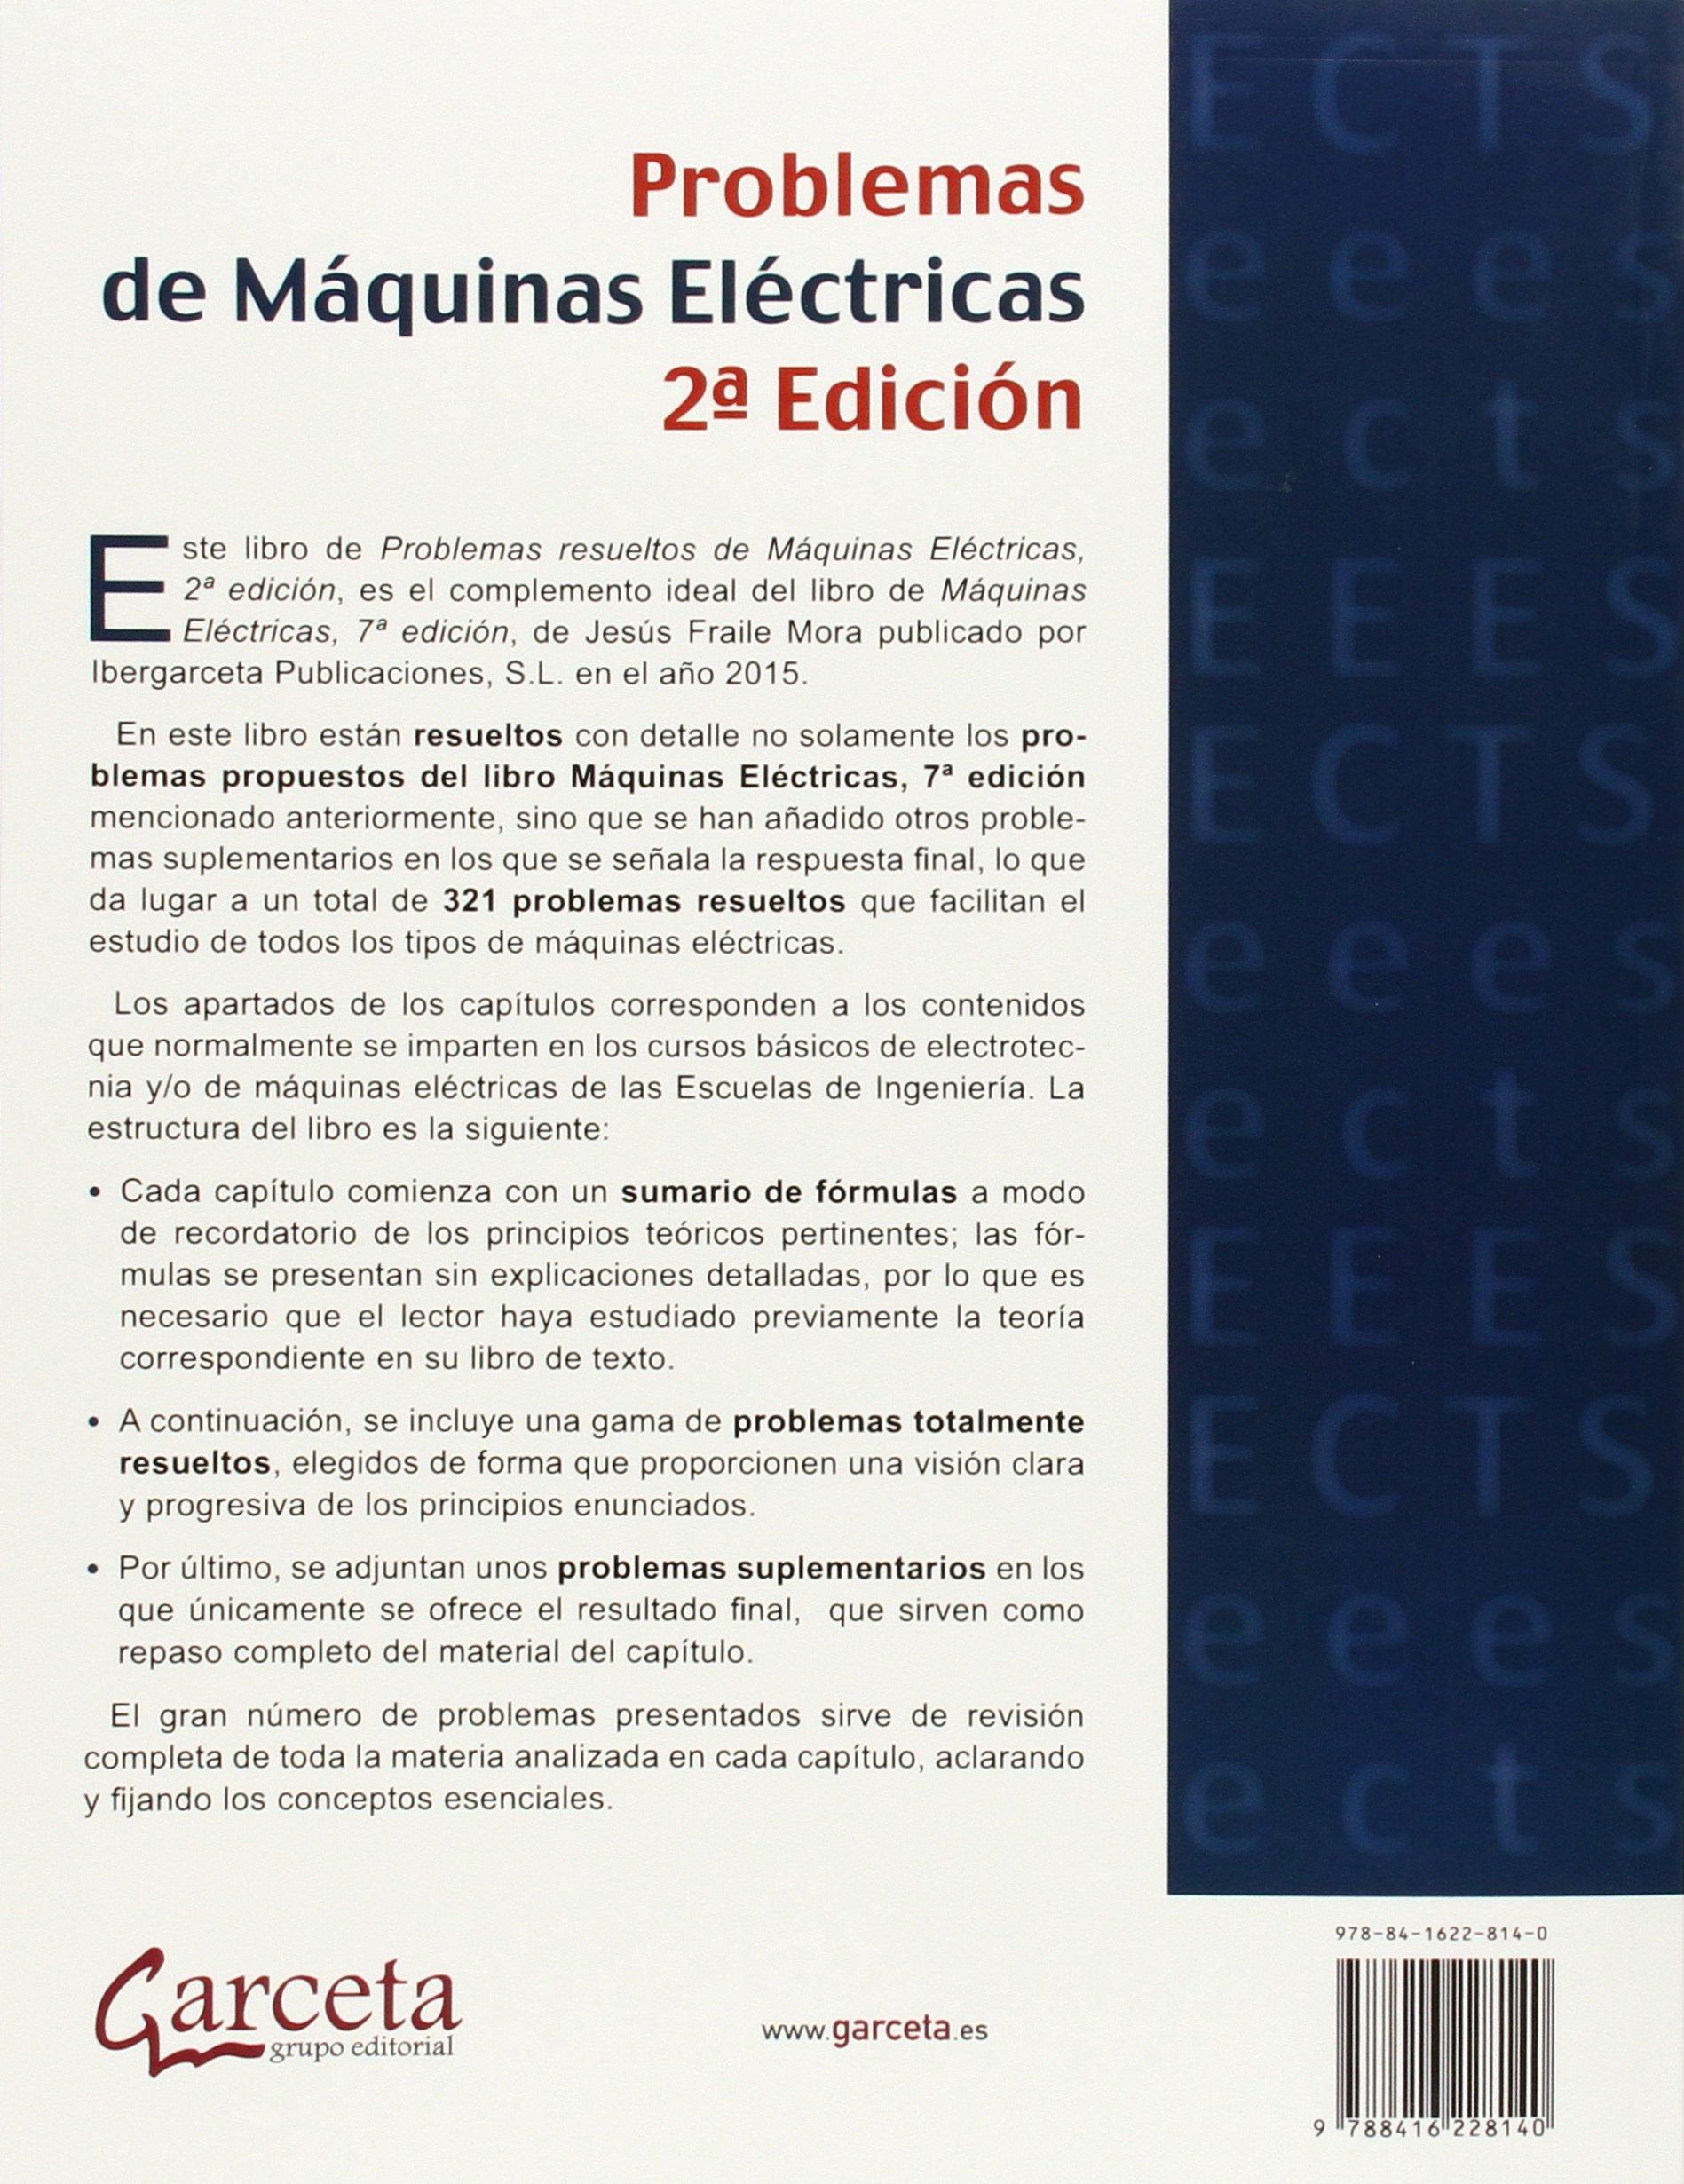 Problemas de Máquinas eléctricas 2ª Edición Texto garceta: Amazon.es: Jesús Fraile Mora, Jesús Fraile Ardanuy: Libros